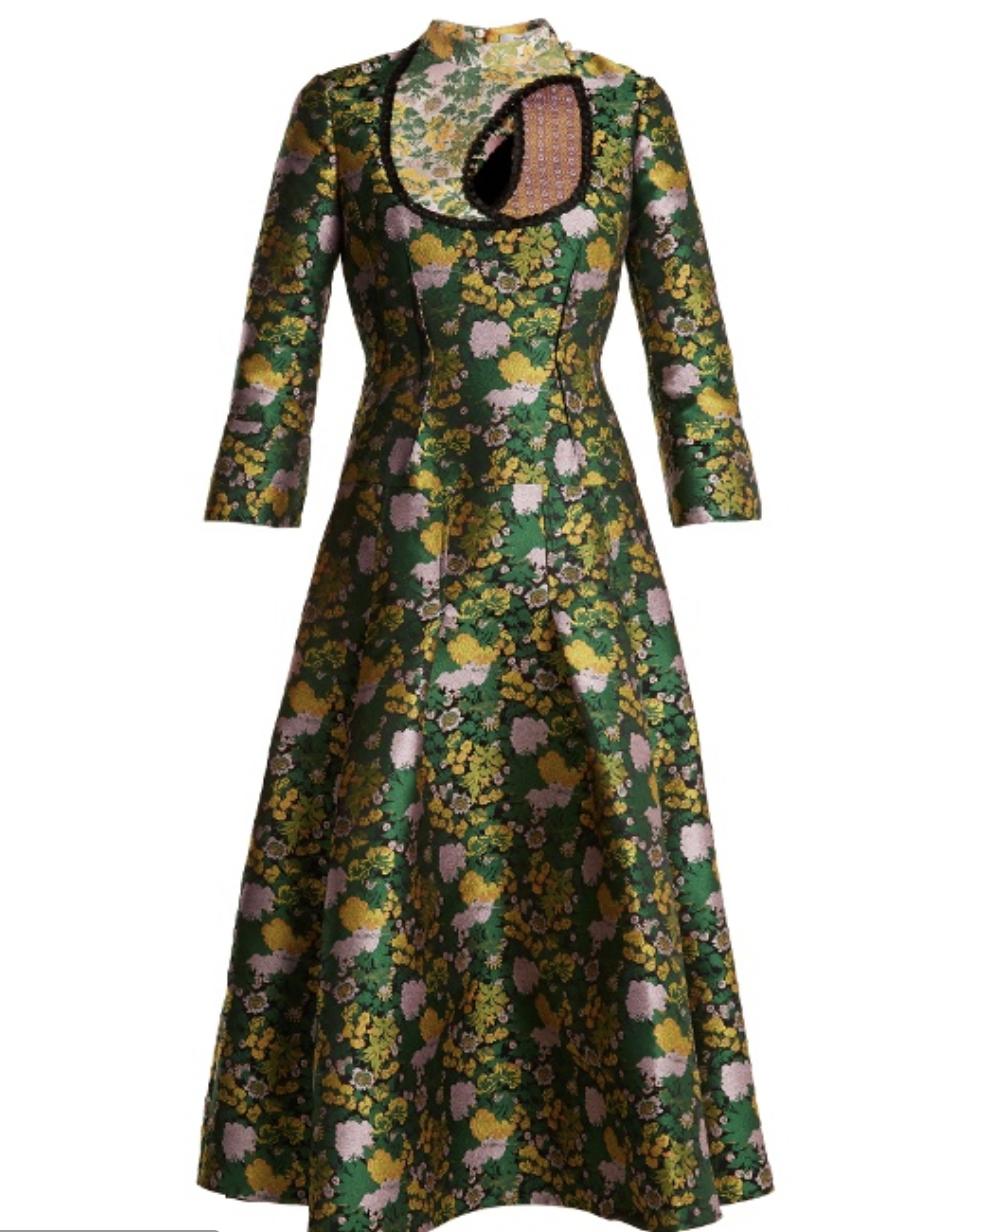 Erdem Dress, $3431